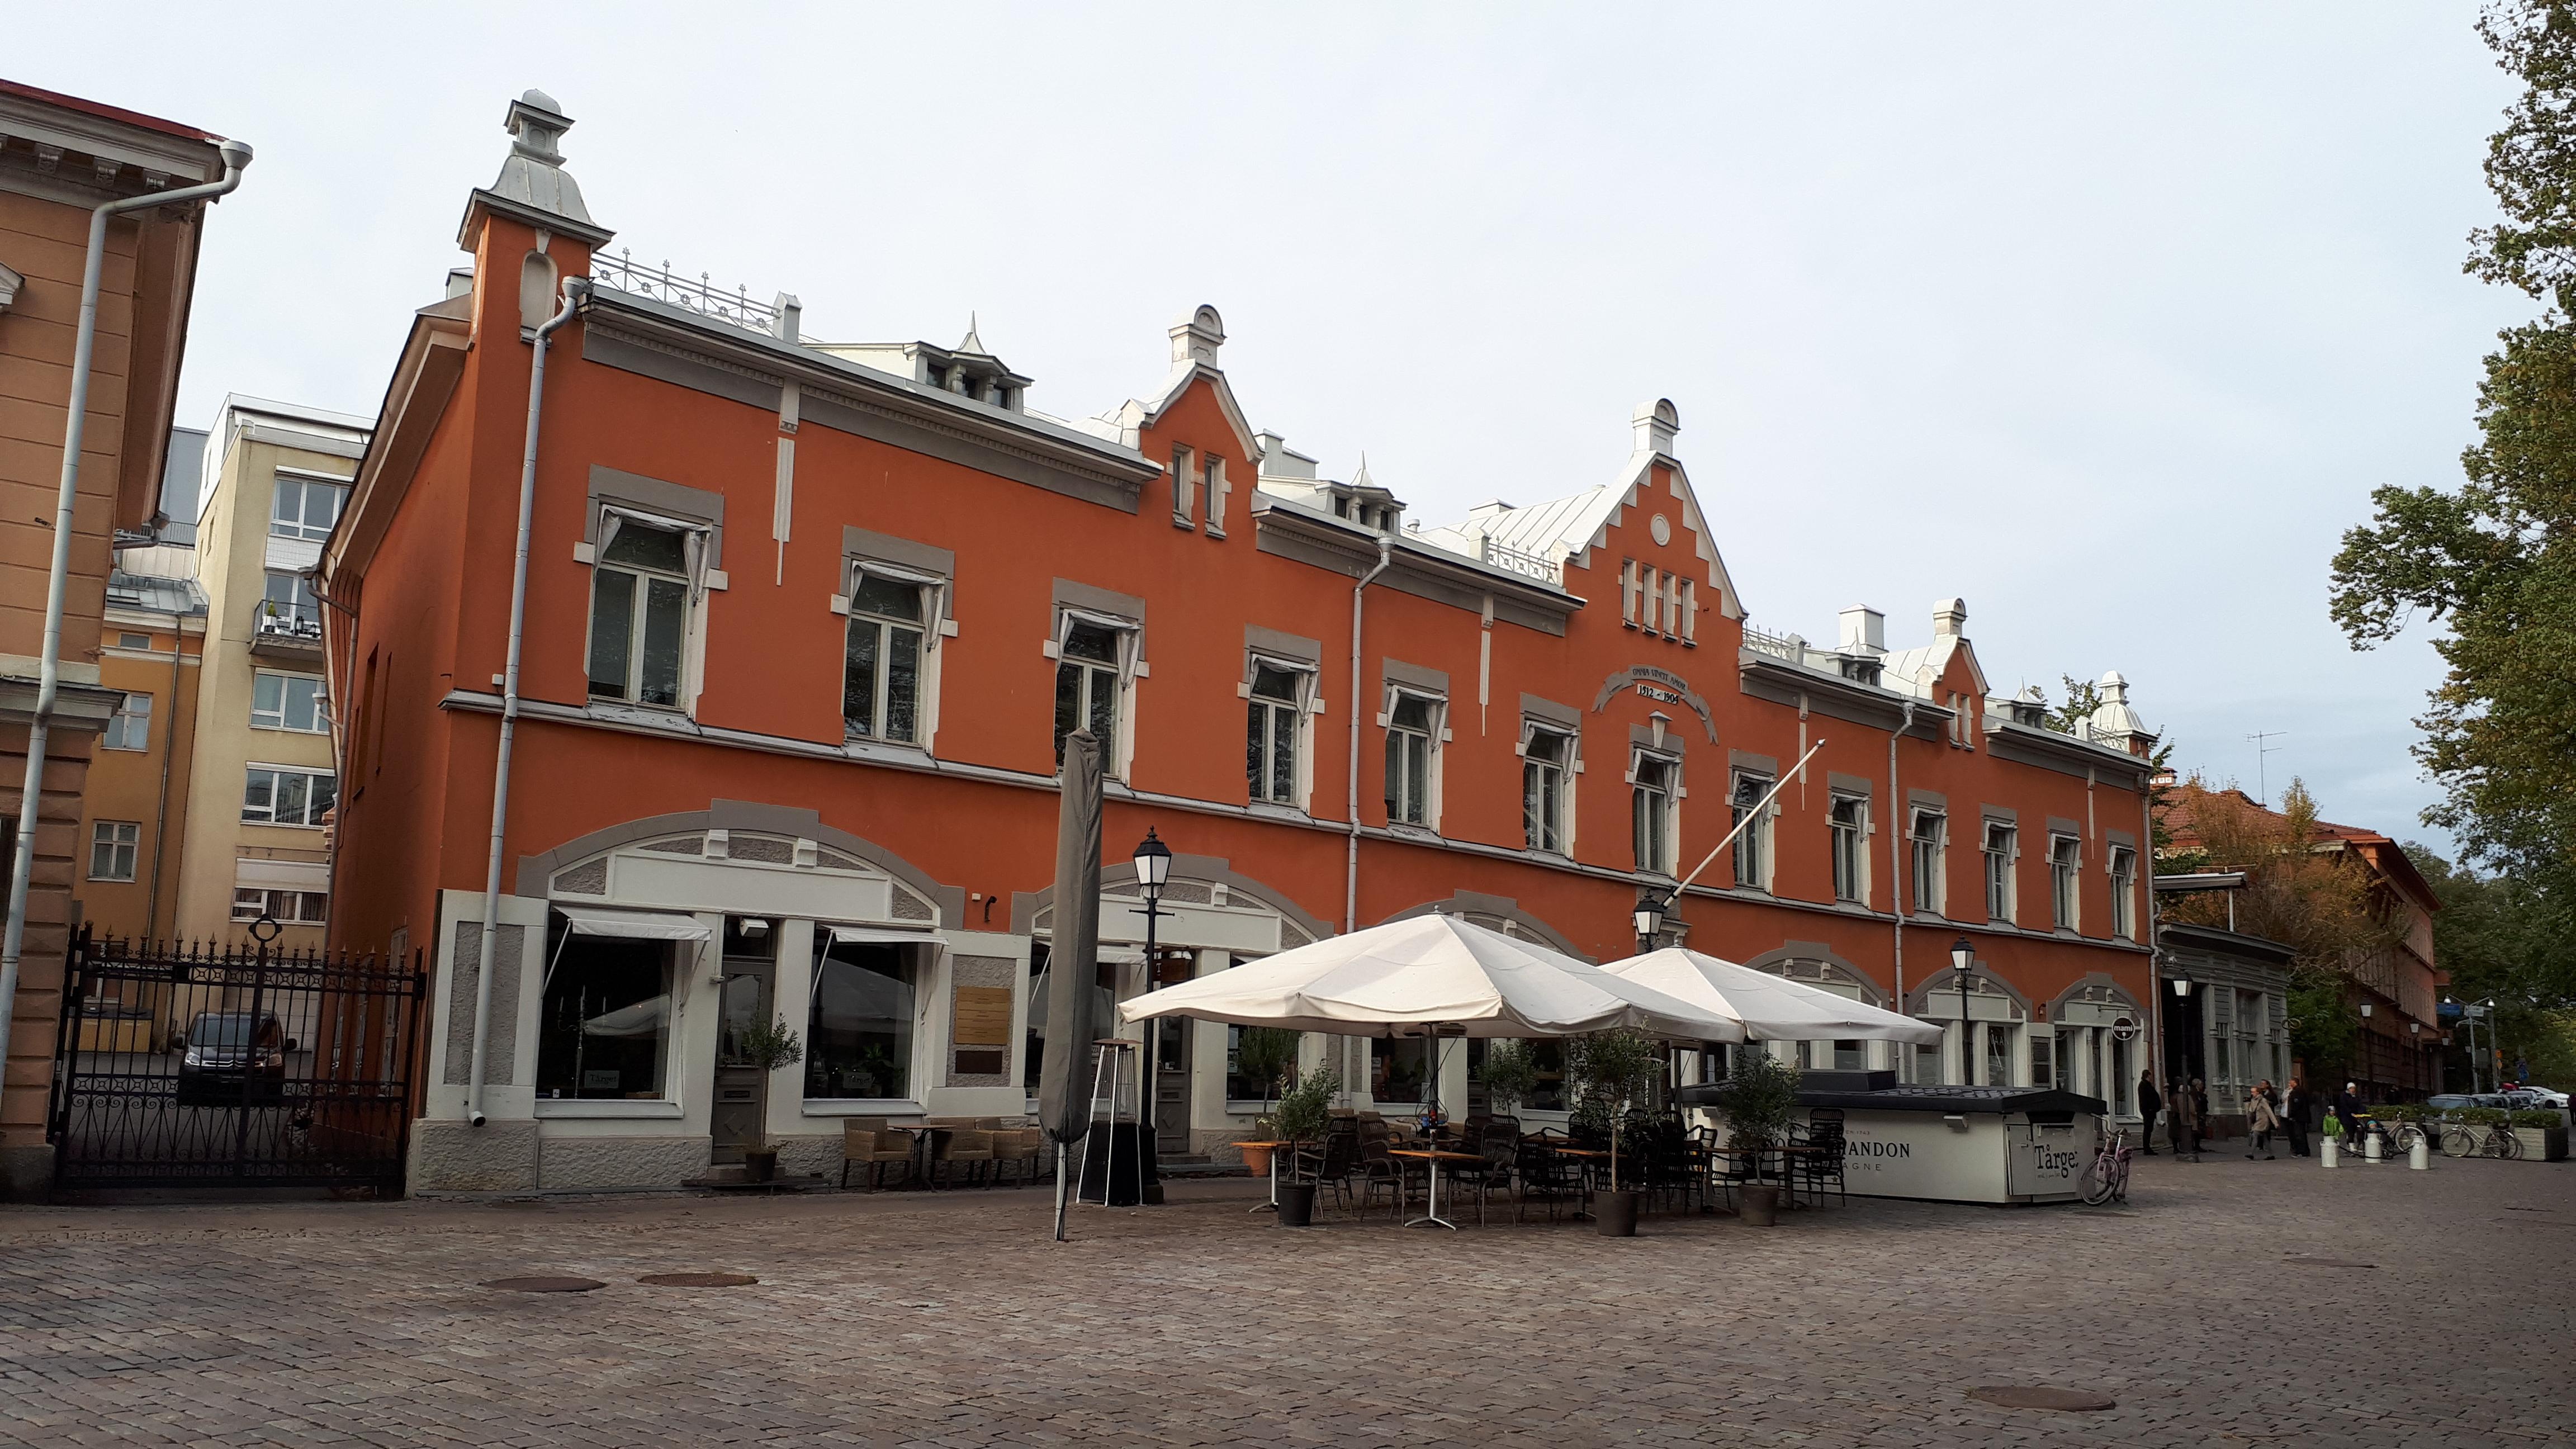 Ingmanin talo Turku 29.9.2018.jpg